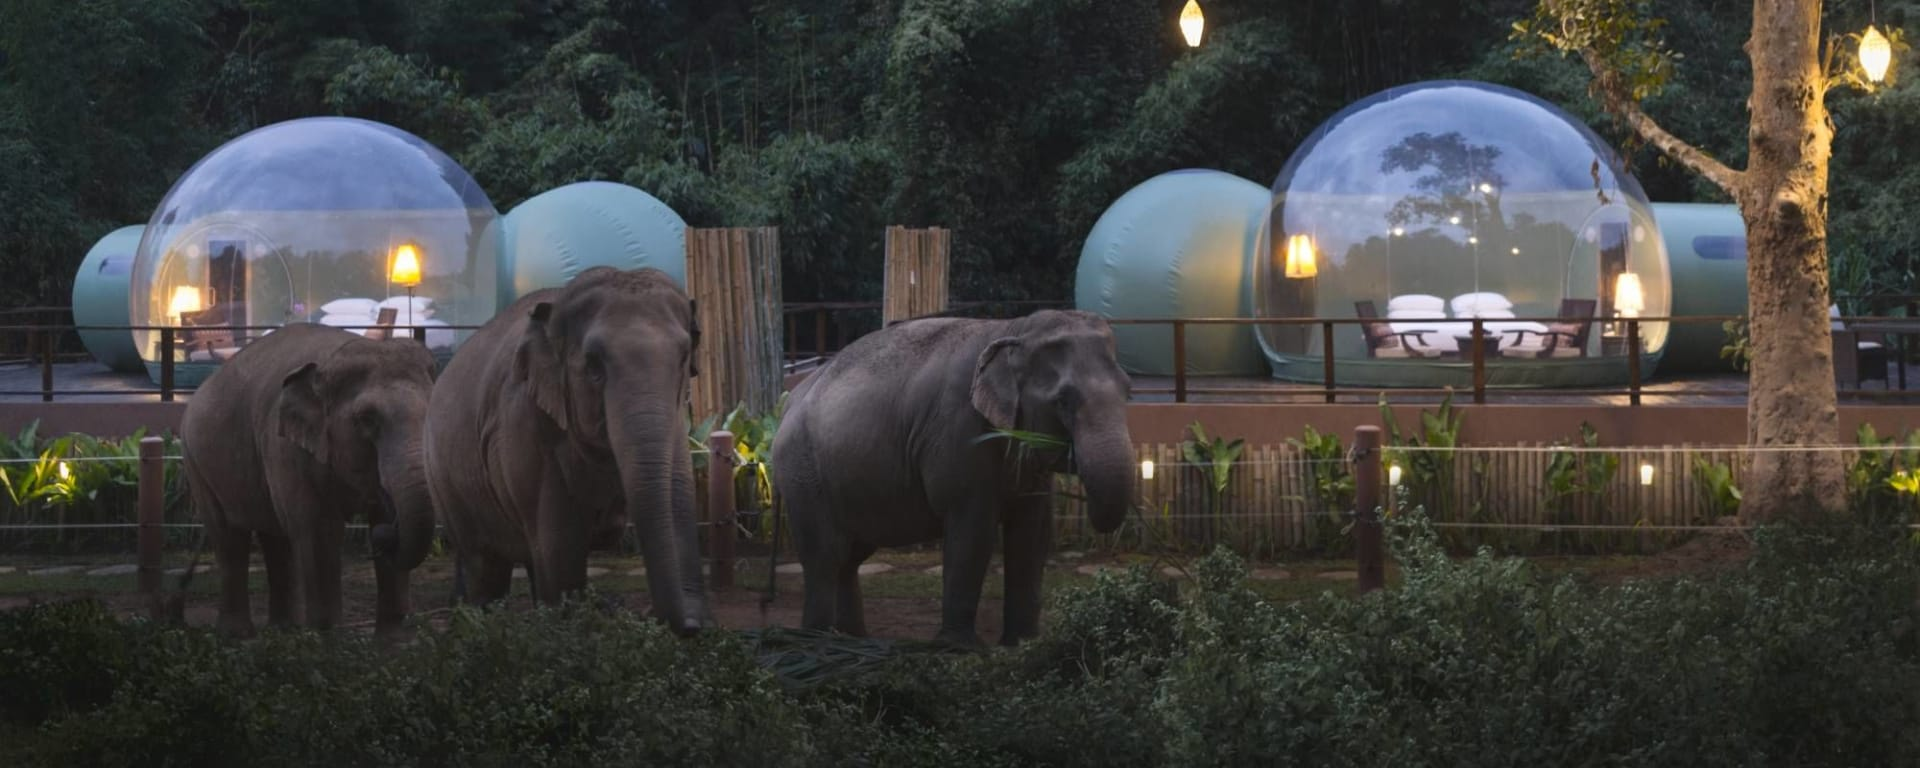 Anantara Golden Triangle Elephant Camp & Resort à Triangle d'Or: Jungle Bubbles at Dawn